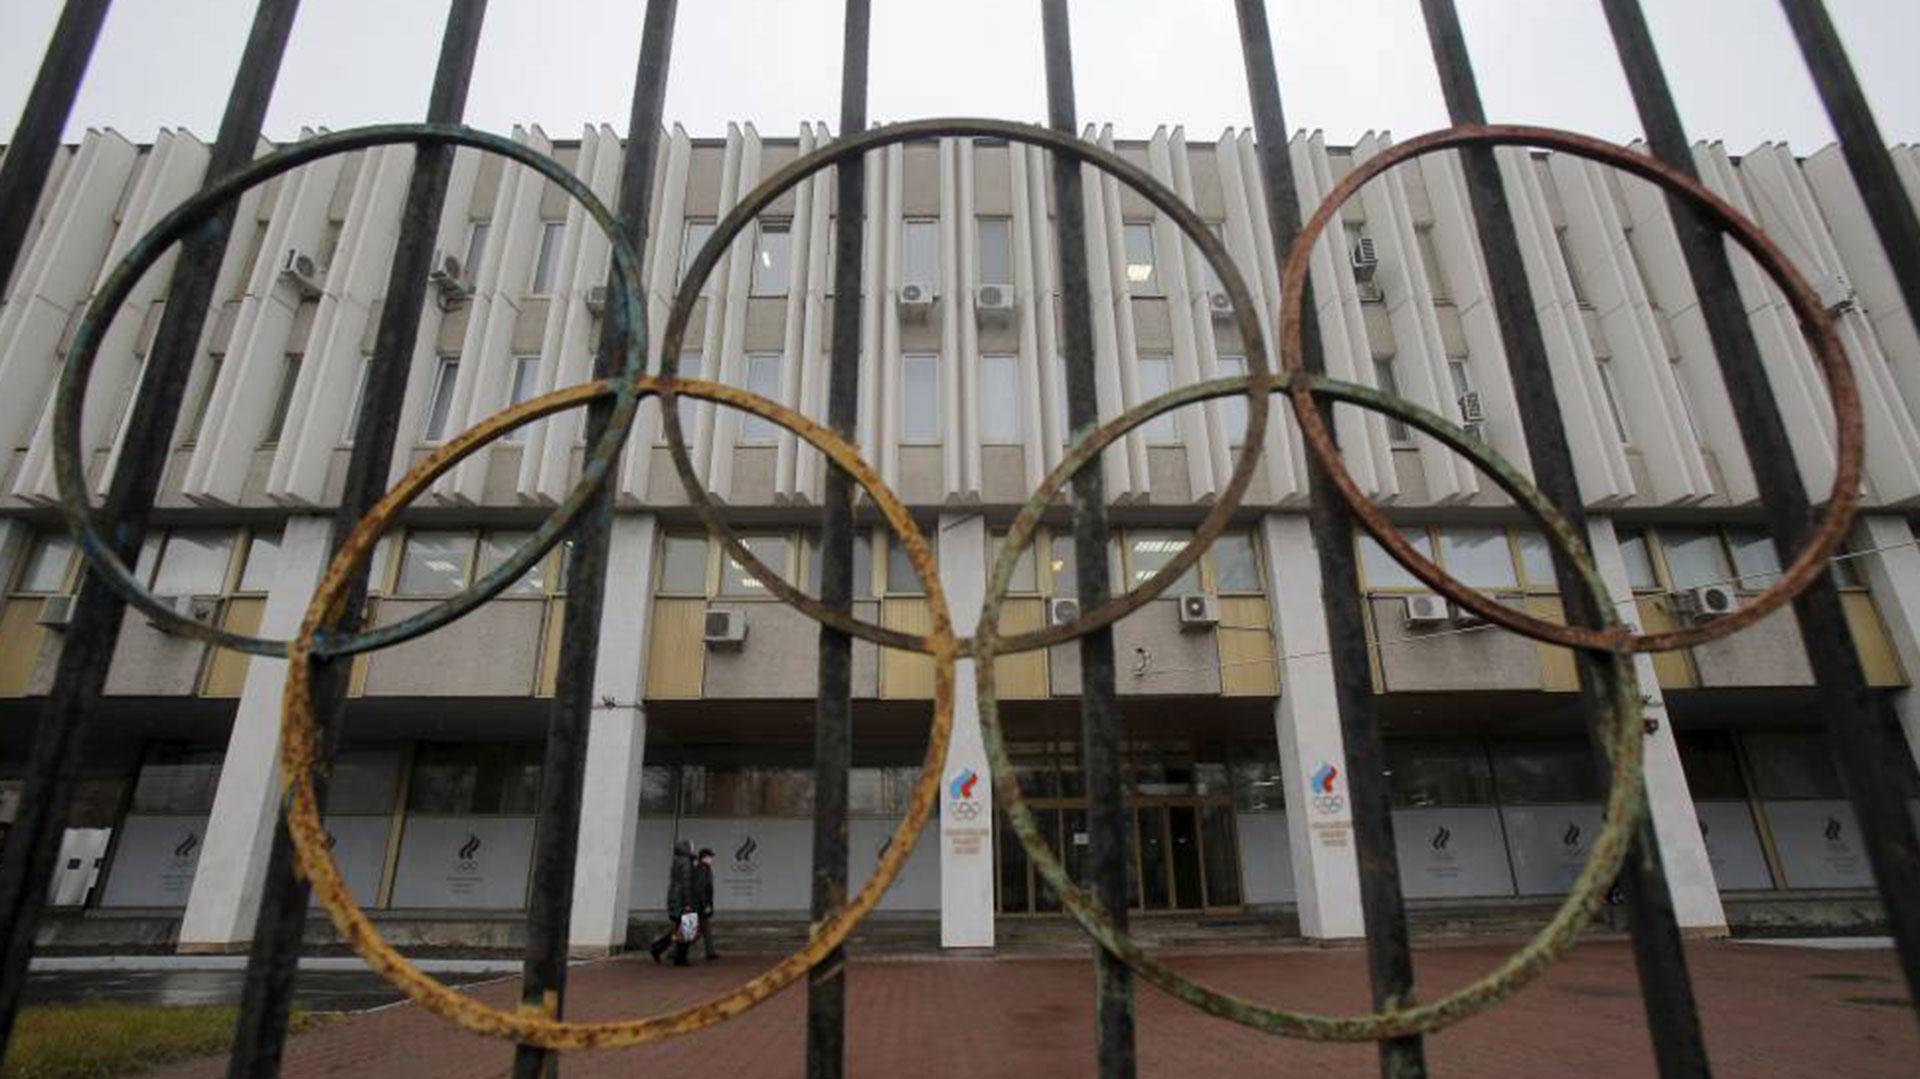 El COI planearía sancionar duramente a Rusia